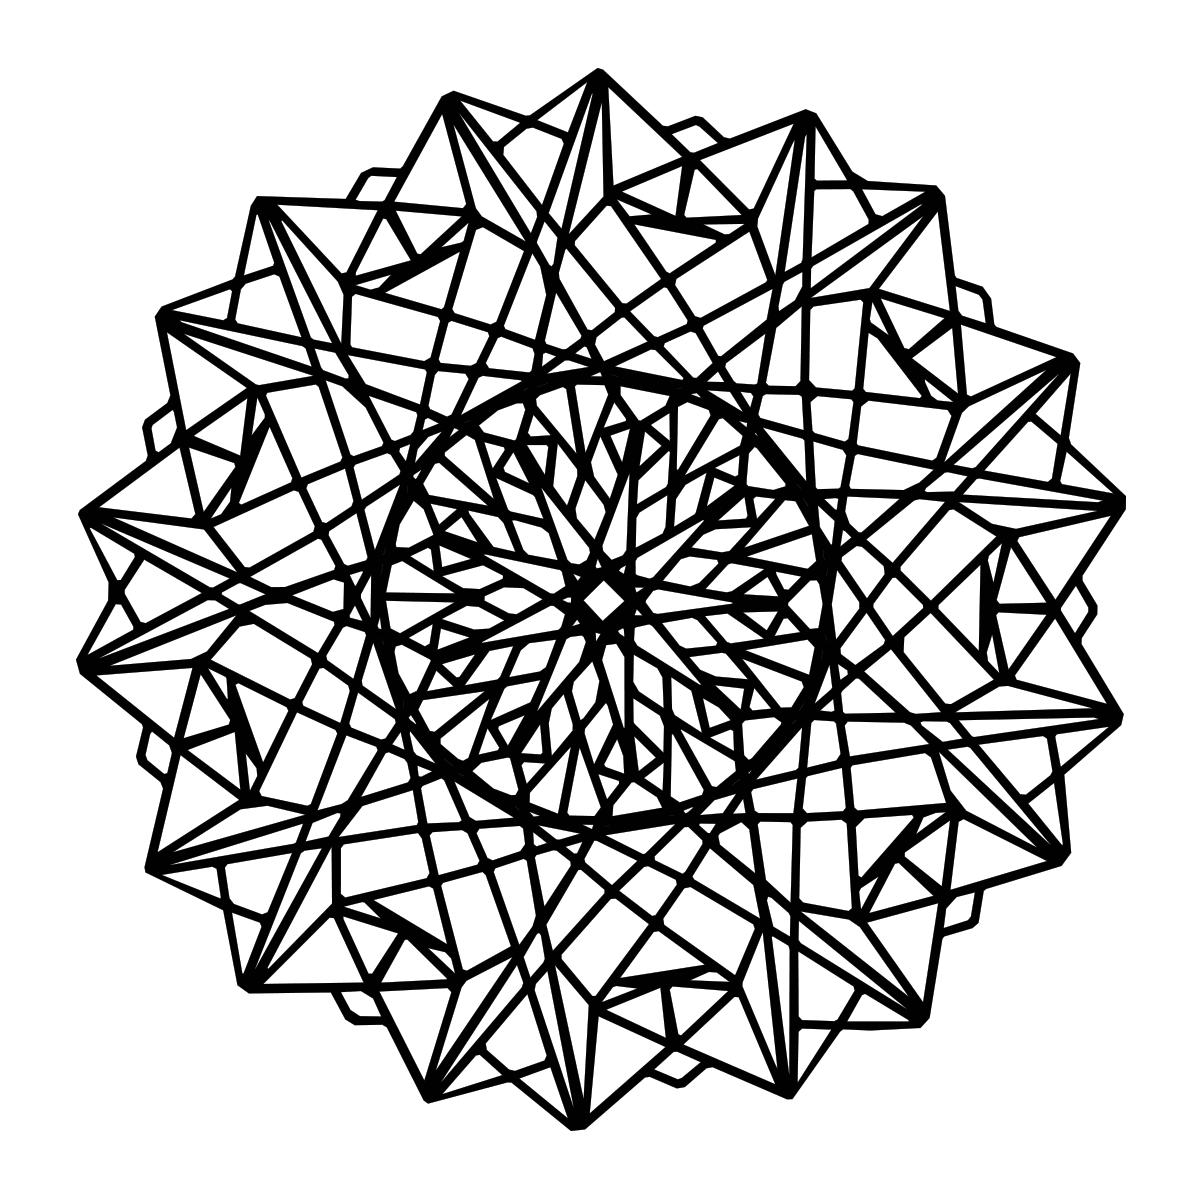 geometric mandala coloring pages - geometric mandala coloring page